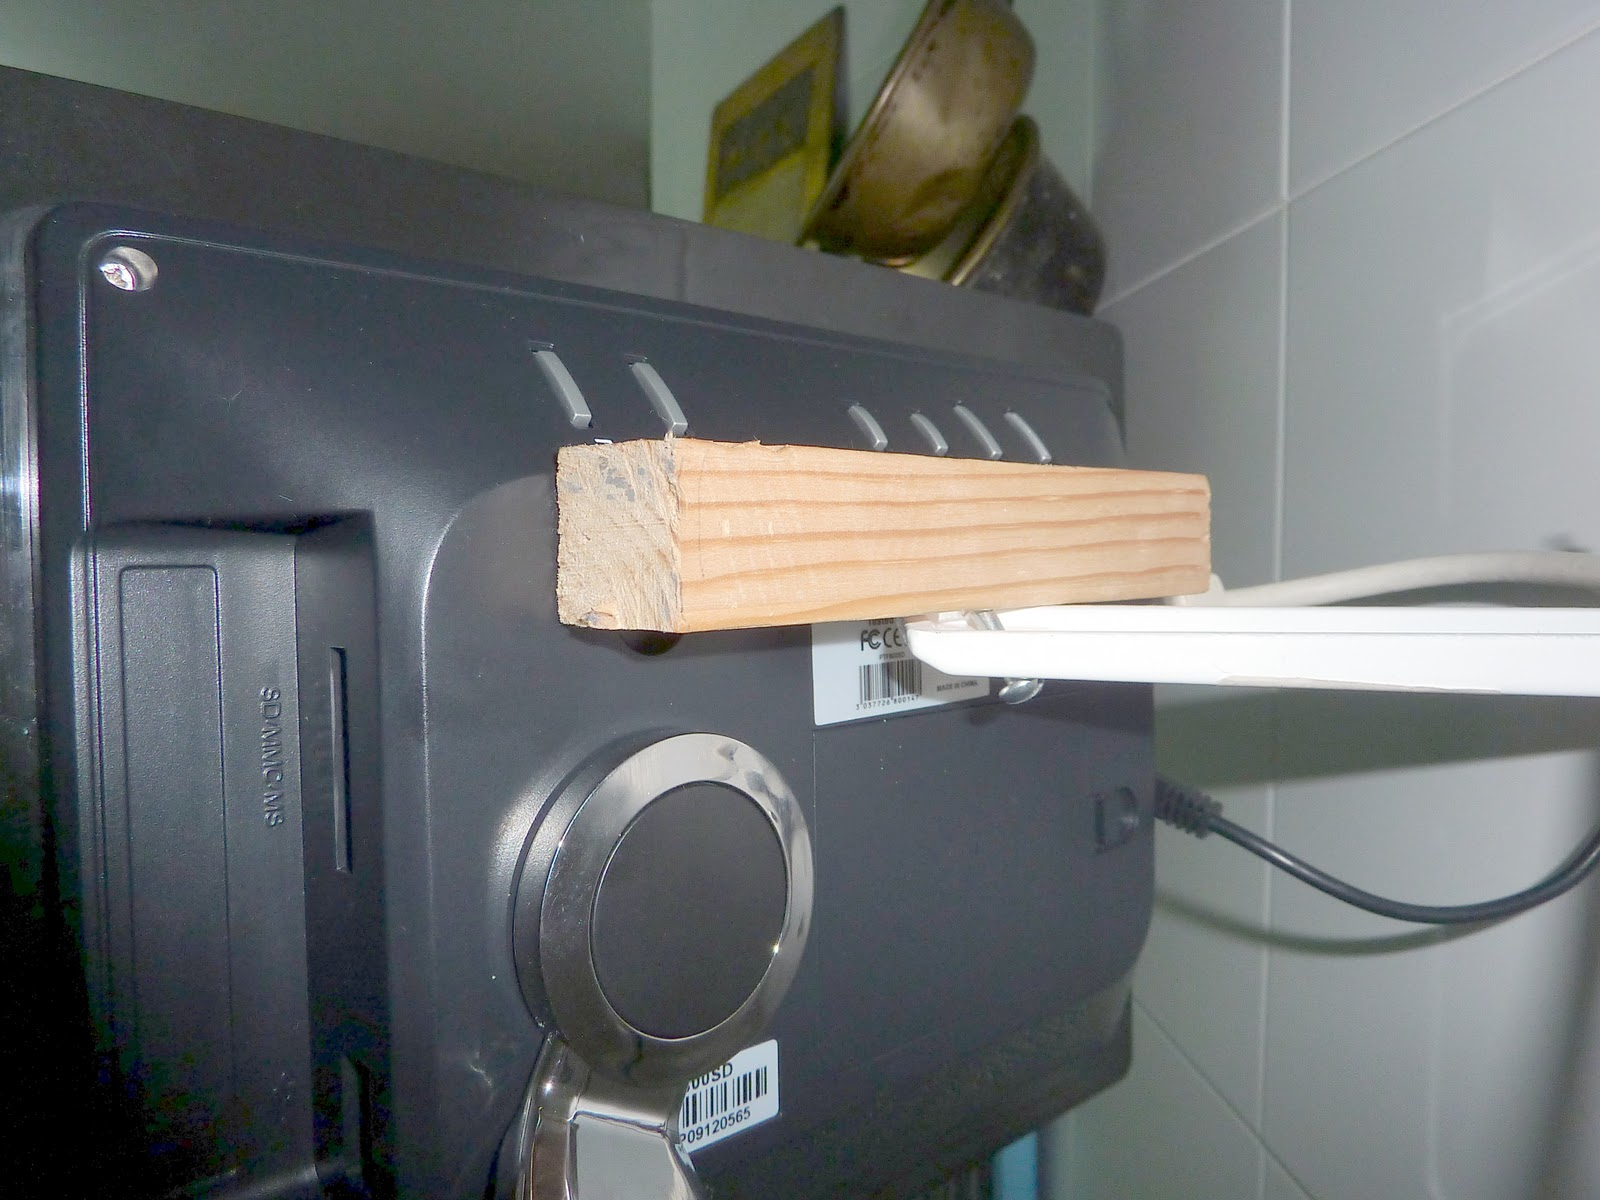 Televisores Pequenos Para Cocina - Diseños Arquitectónicos - Mimasku.com